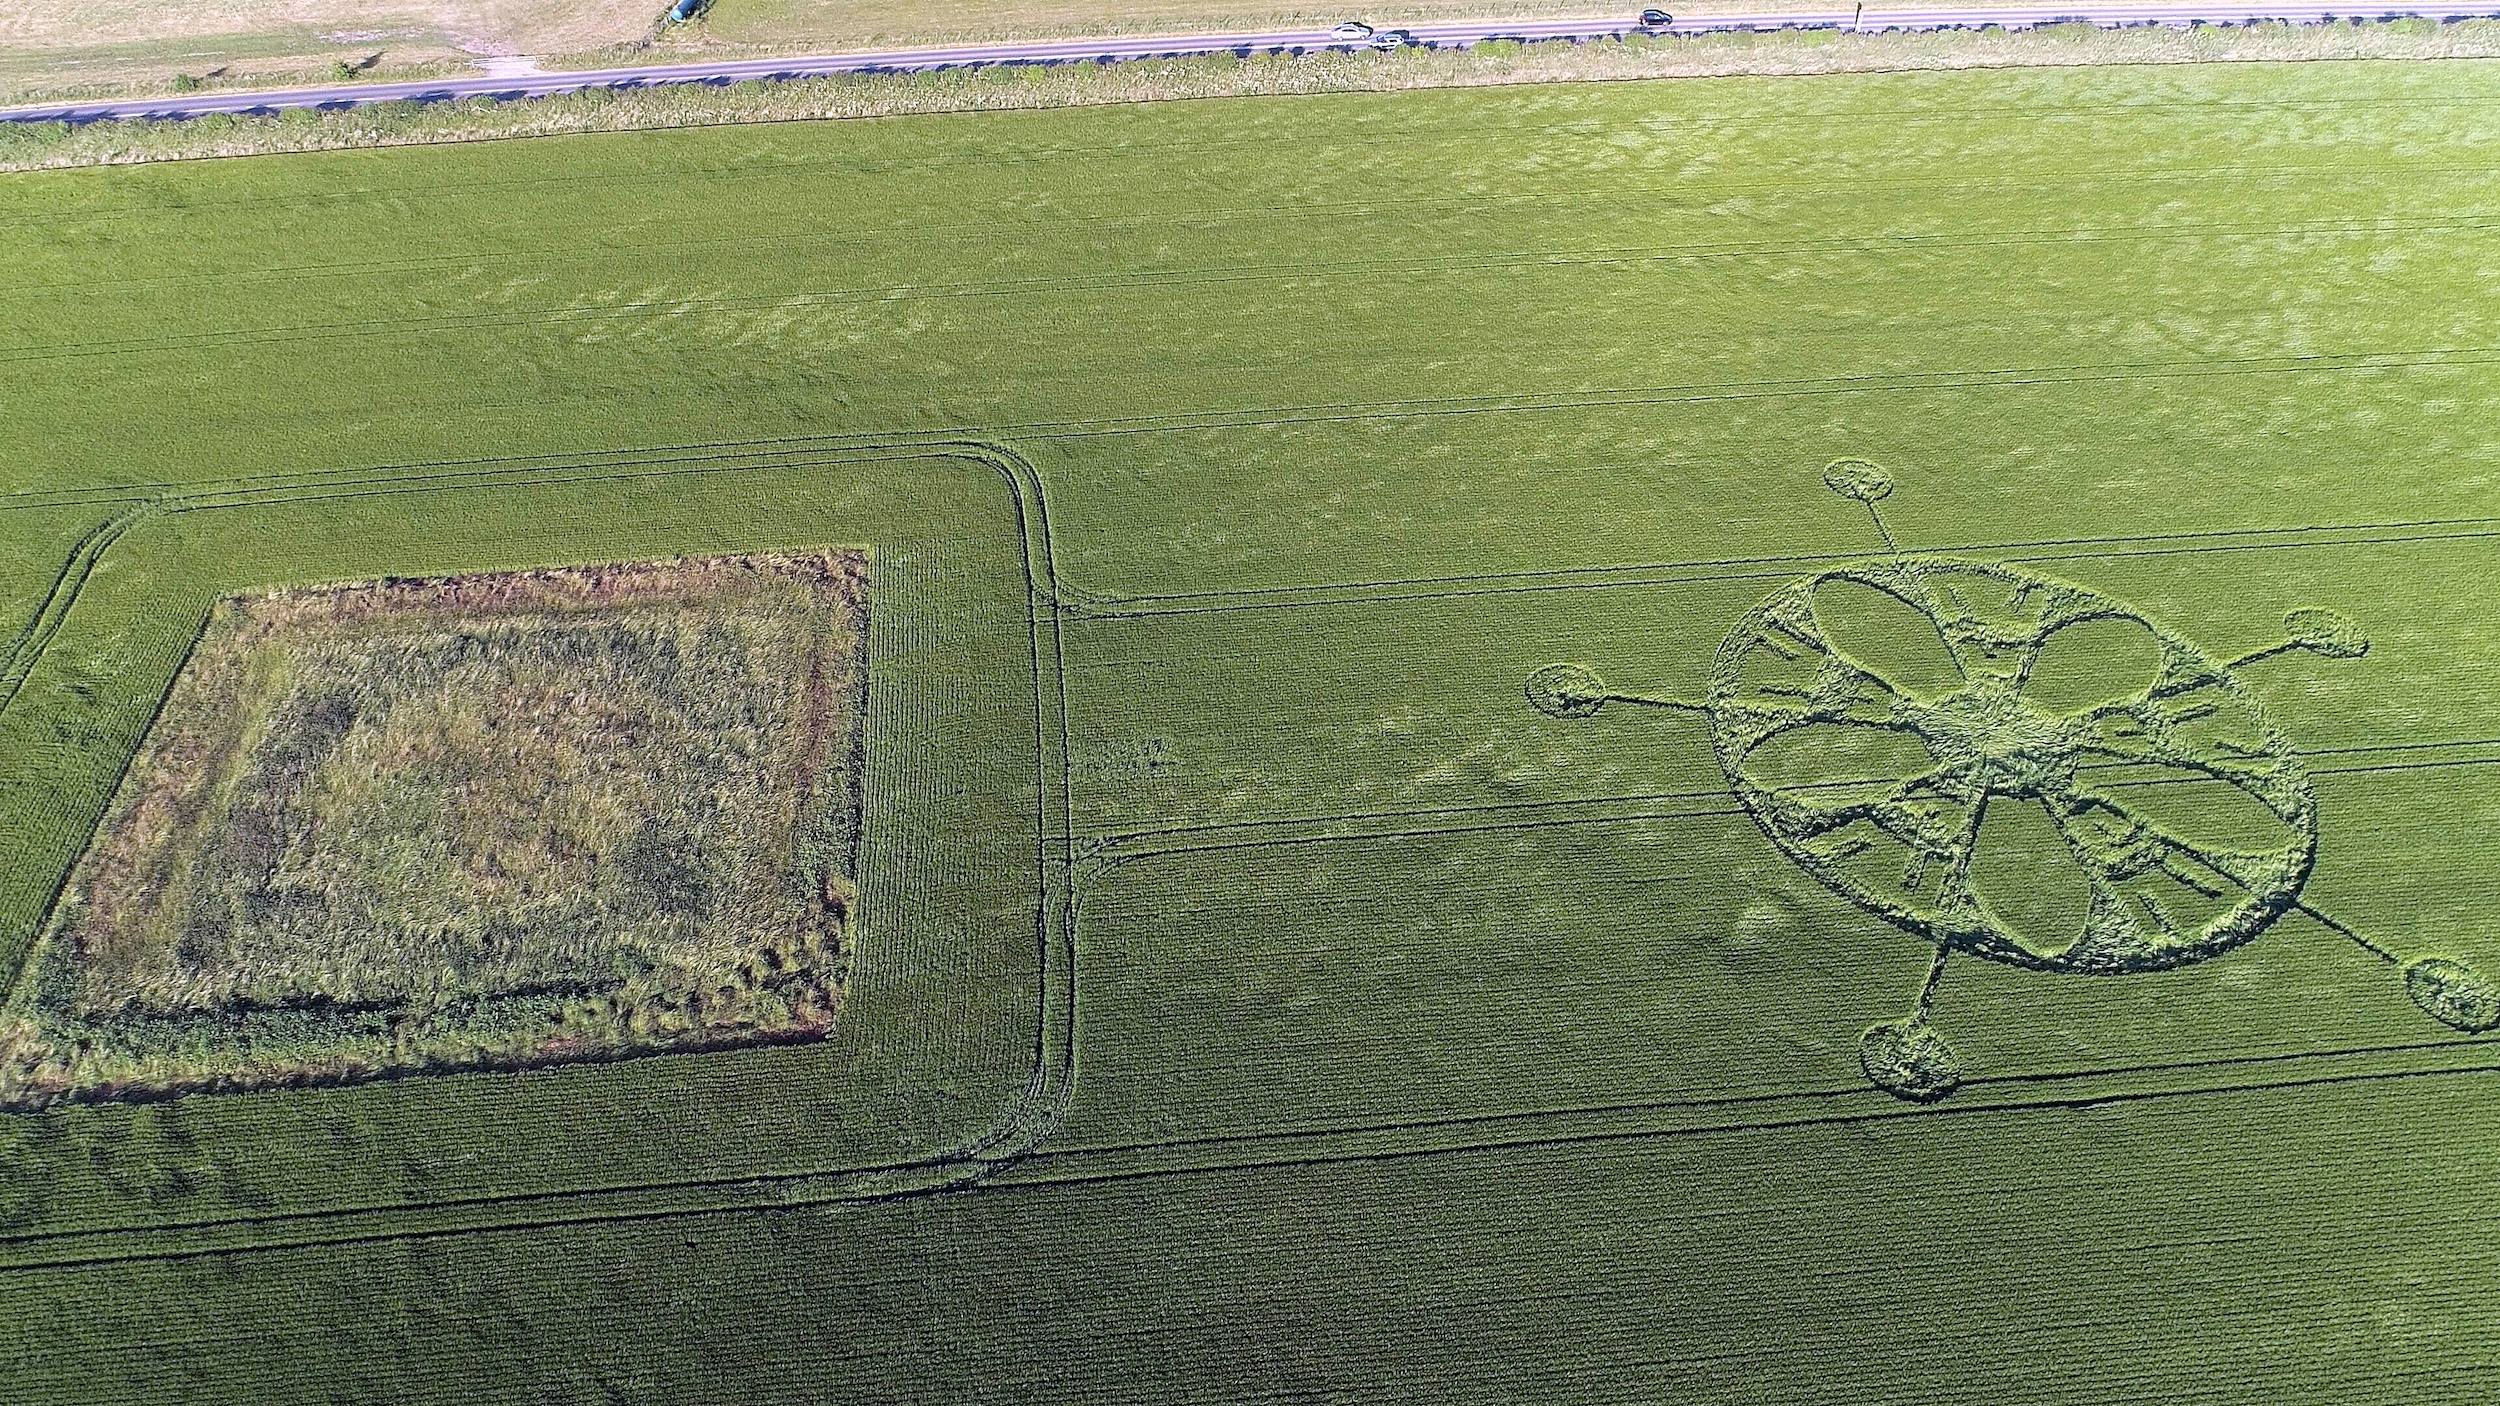 Crop circle near the road to Stonehenge. Image courtesy of Paul Deeman